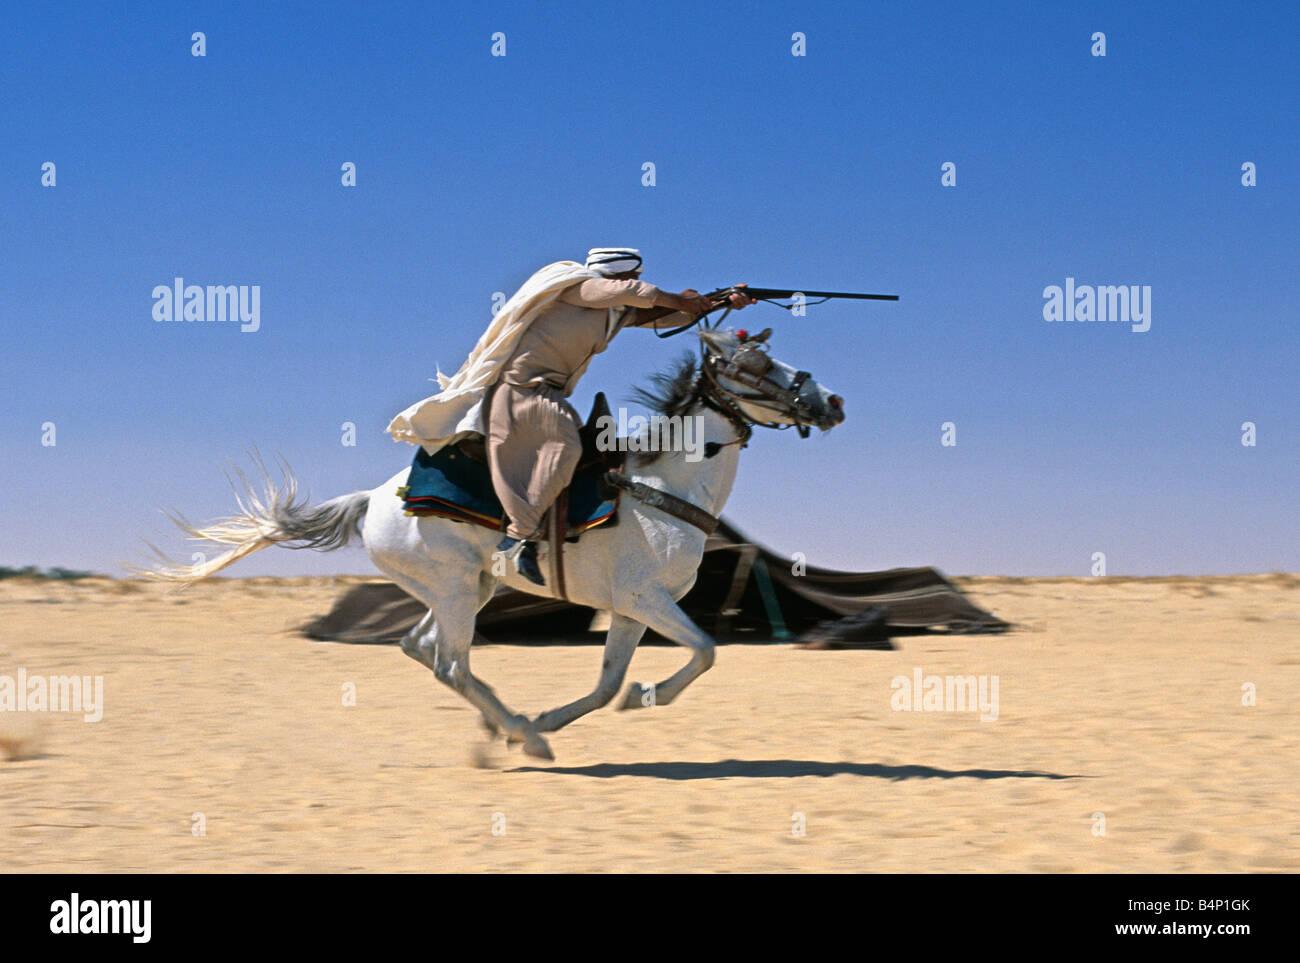 Fall Nature Wallpaper Free Algeria Touggourt Bedouin Man On Horse During Festival